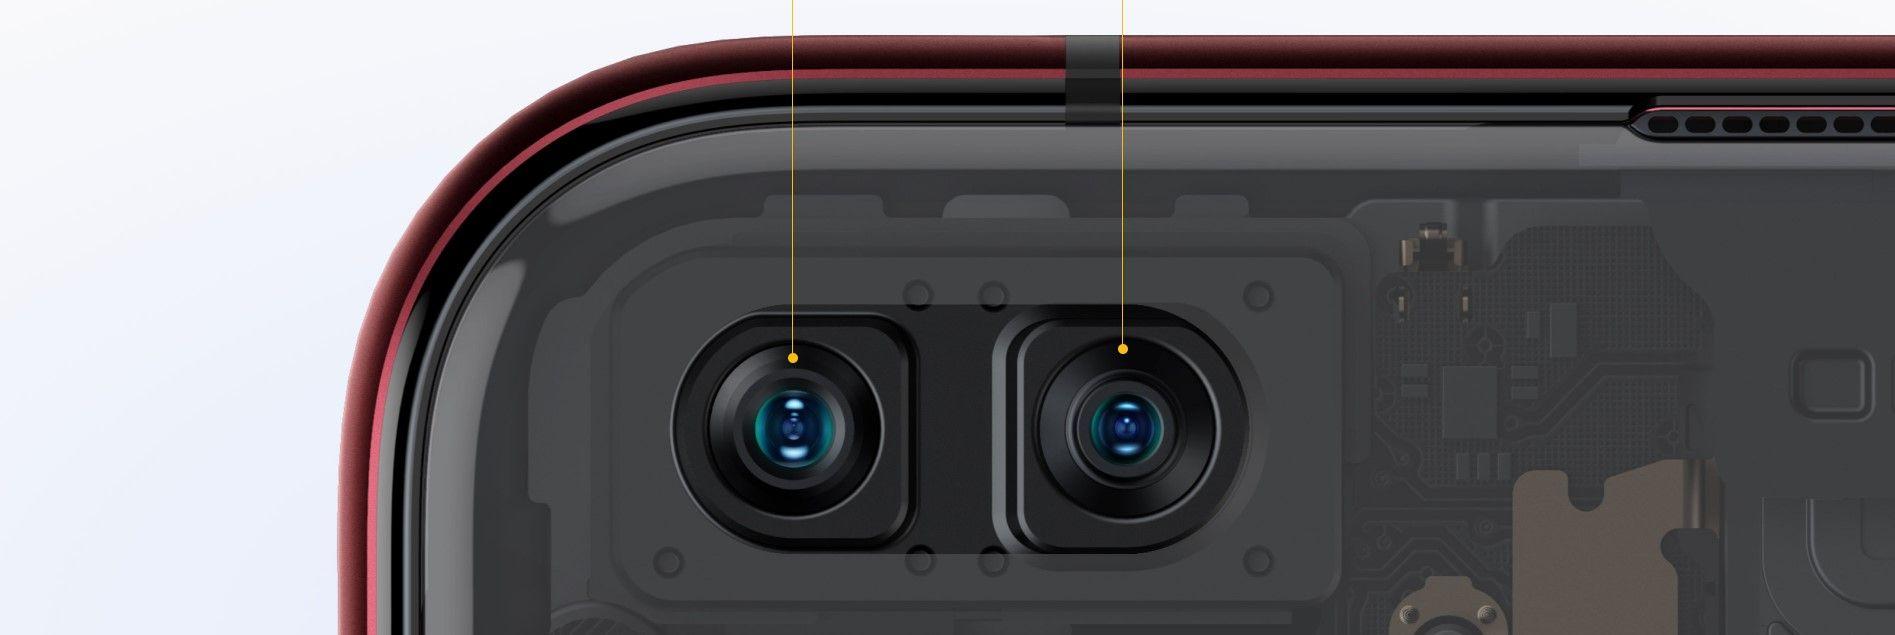 Realme X50 Pro фронтальная камера